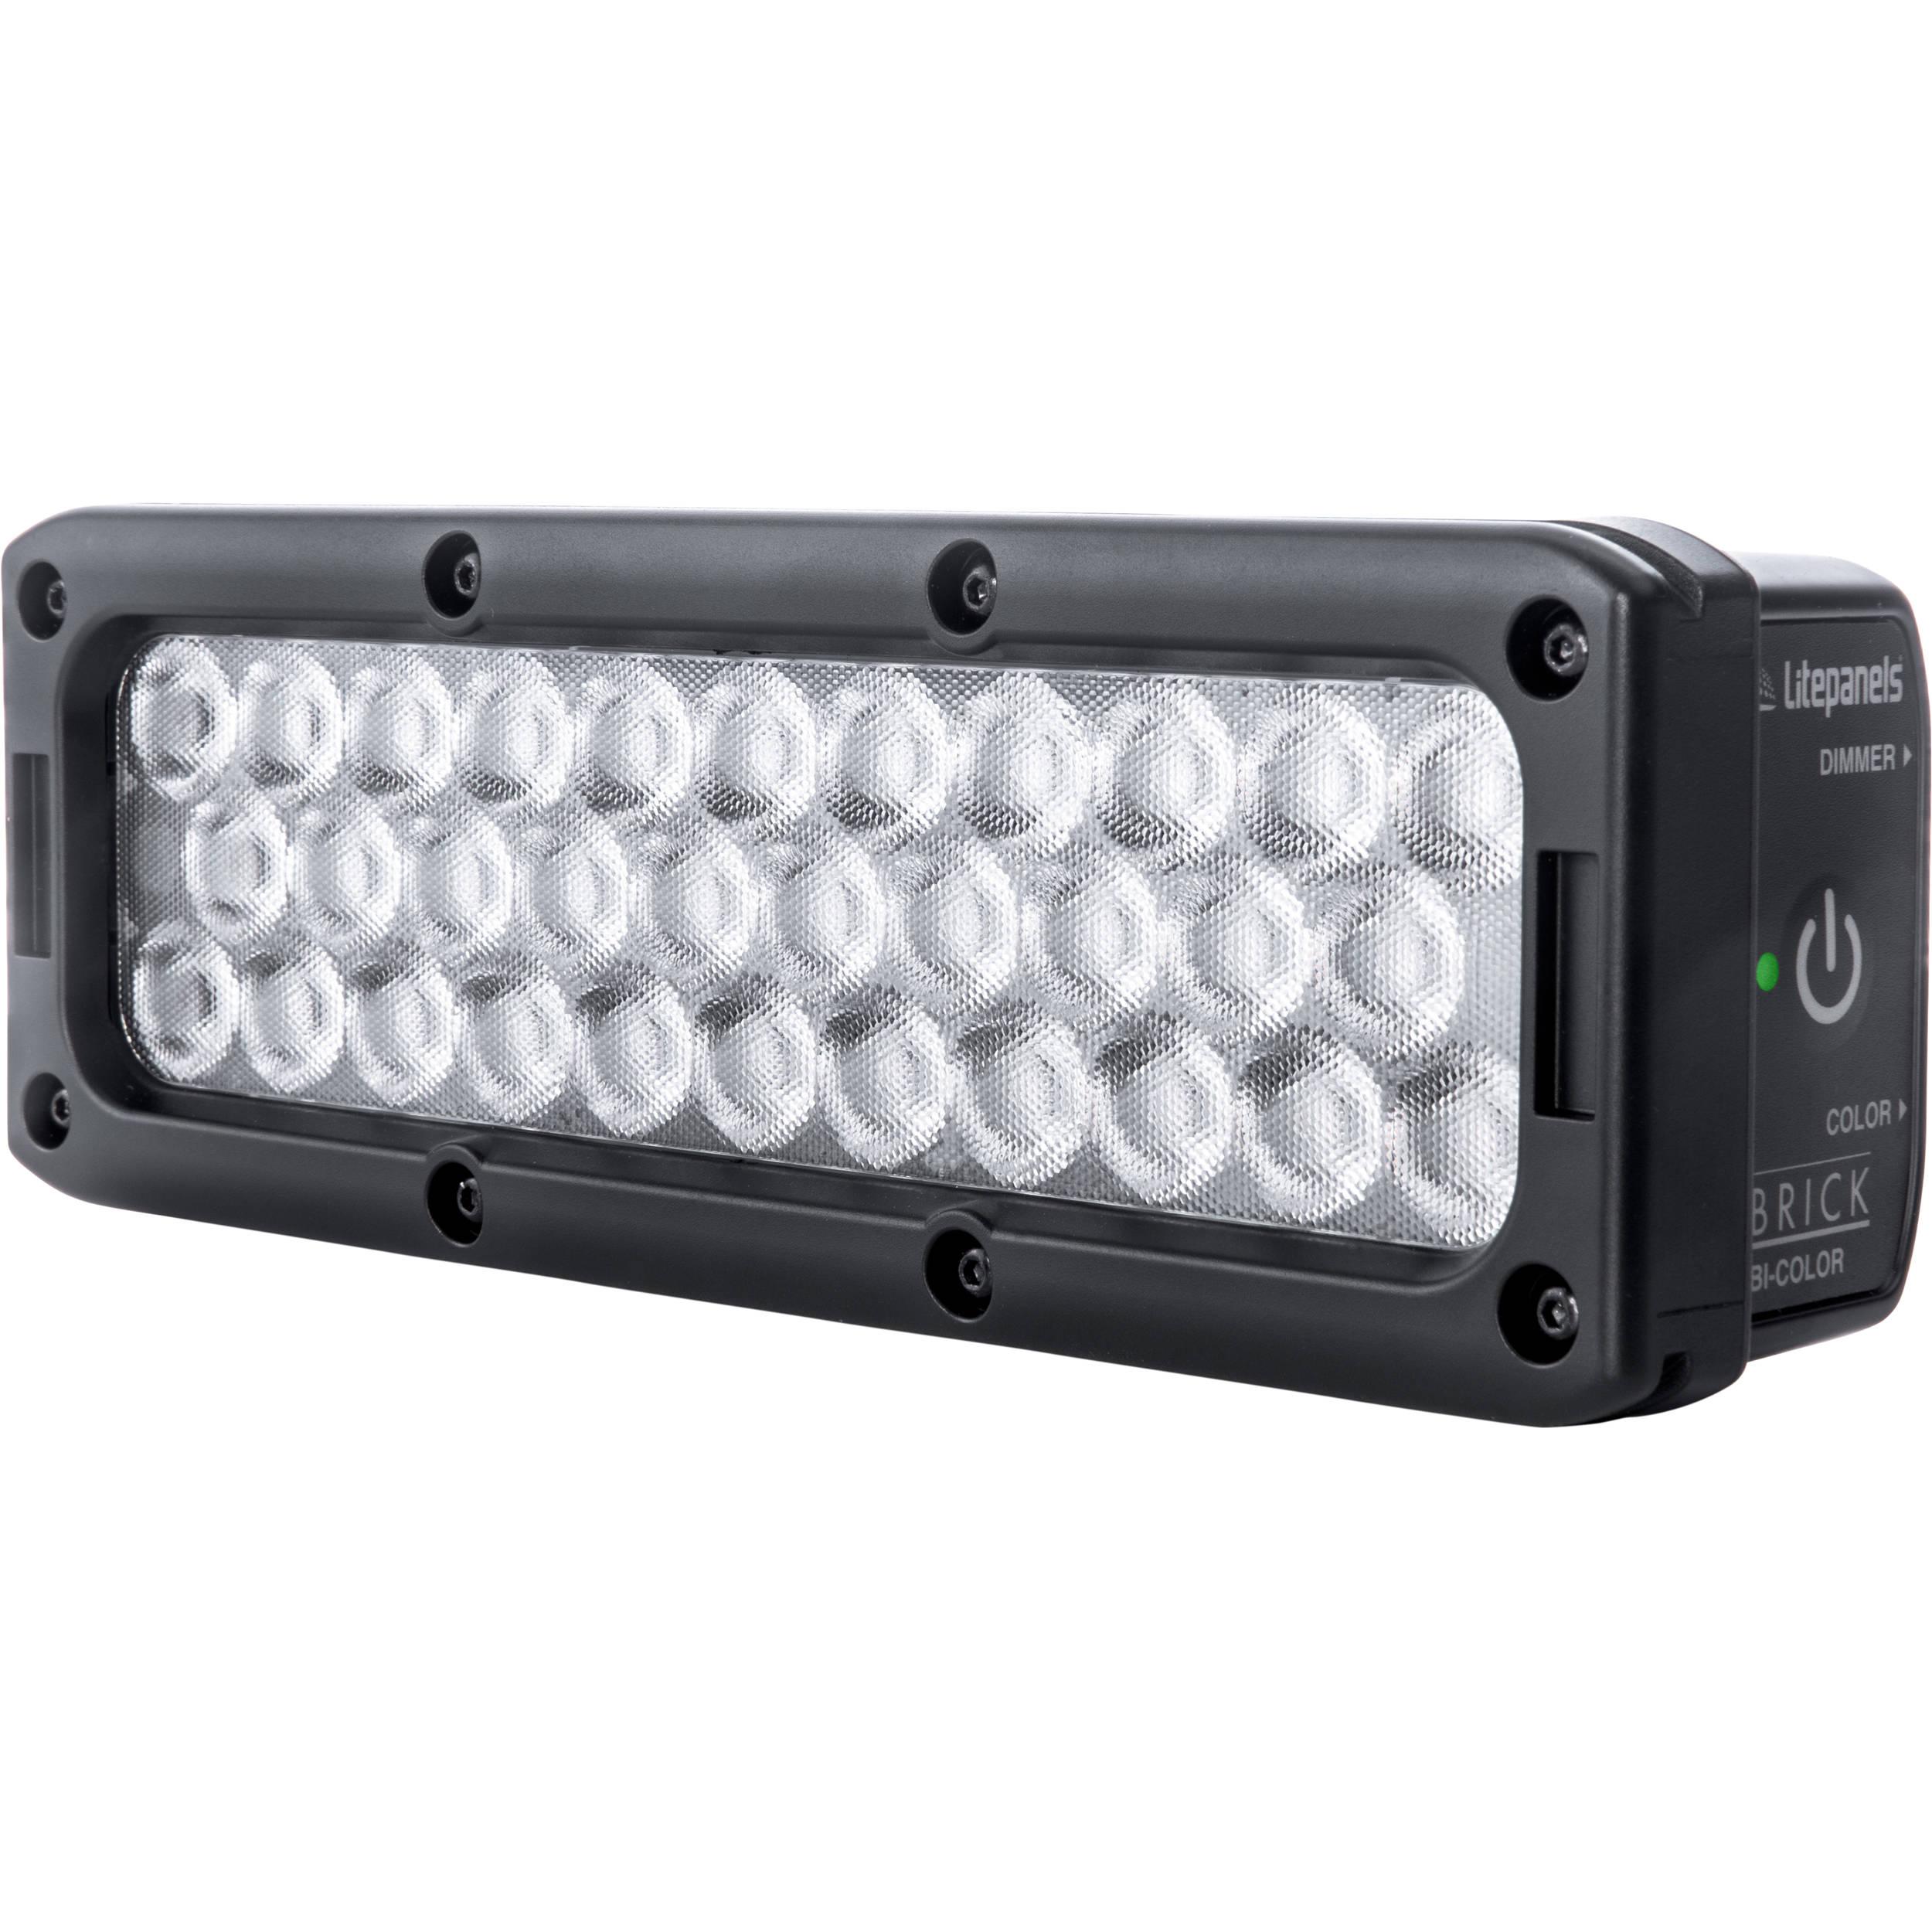 Litepanels Brick Bi Color On Camera Led Light 915 1003 Bh Photo Options Solid Leds